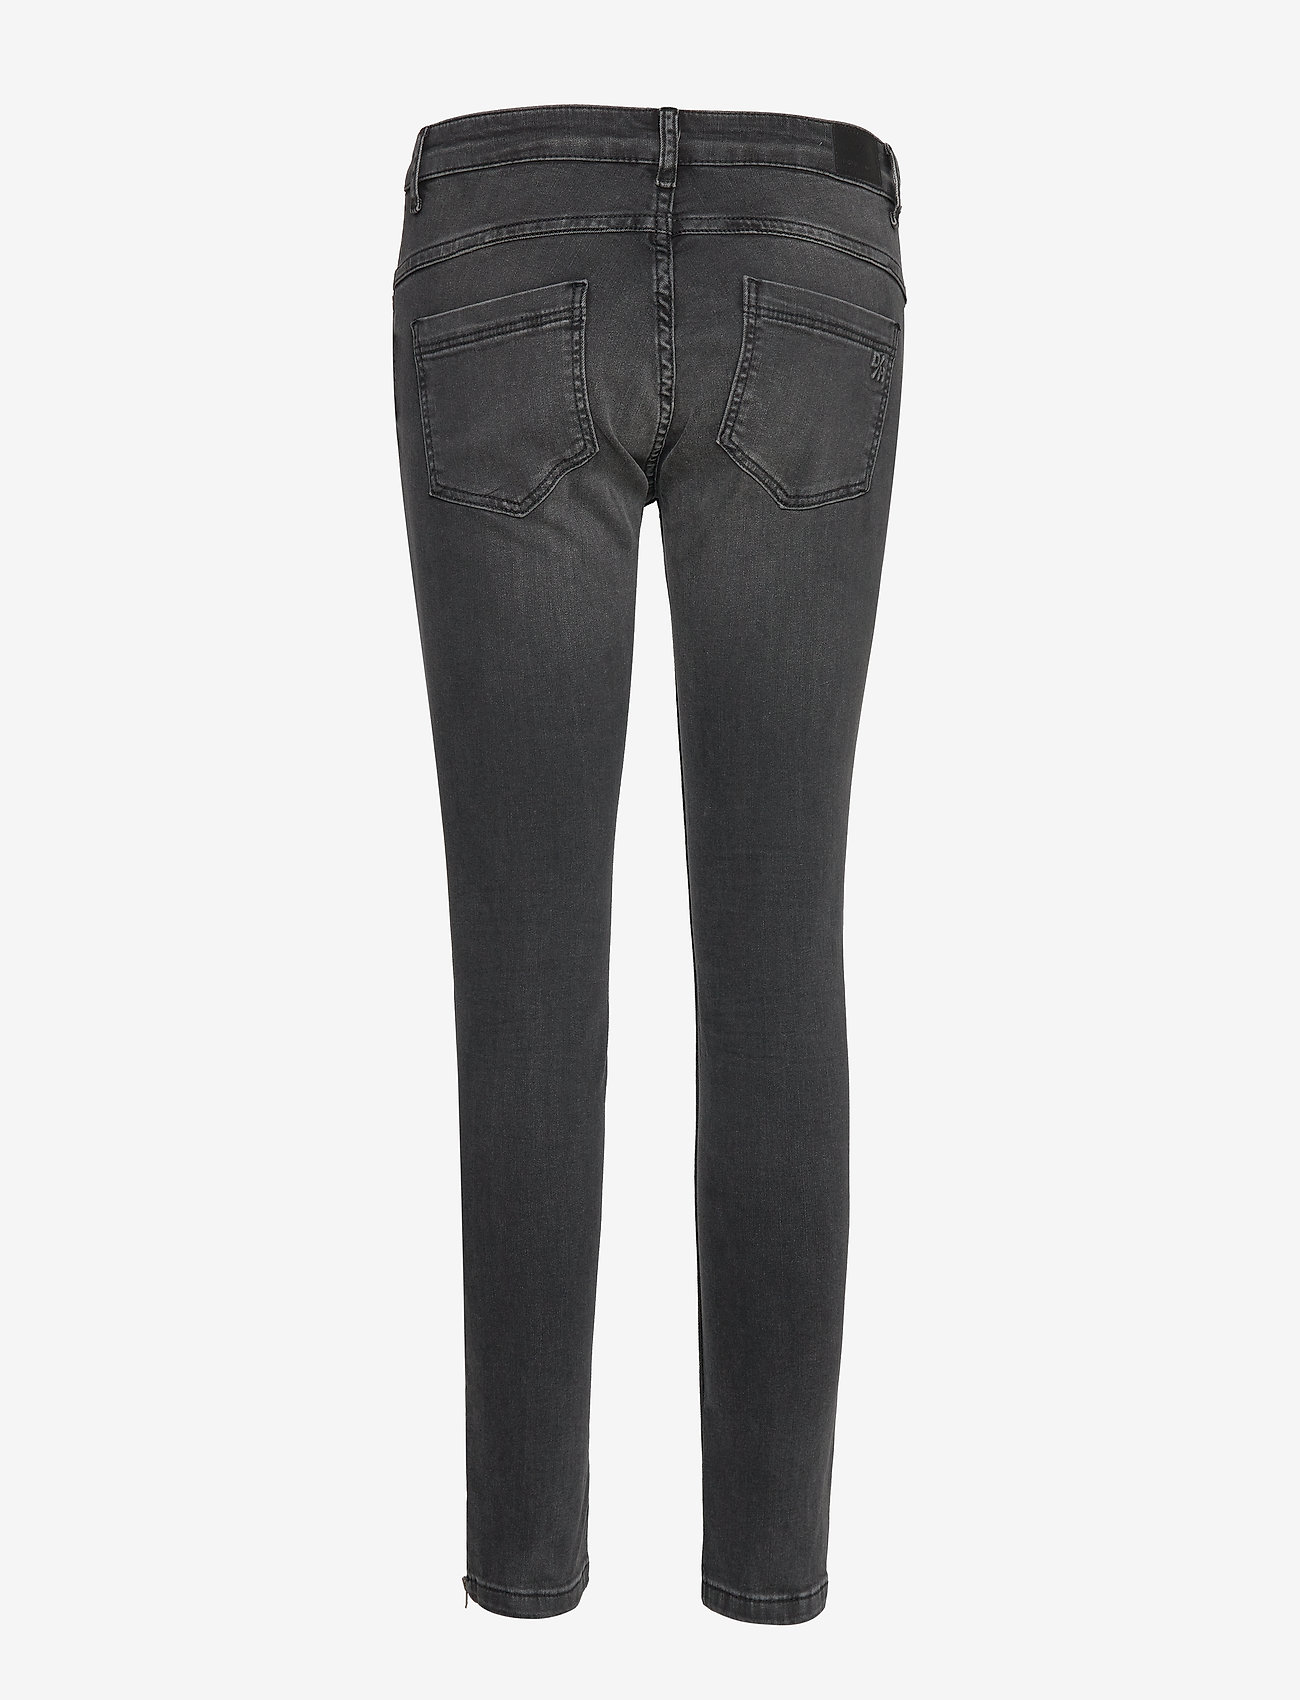 Denim Hunter - 31 THE CELINAZIP CUSTOM - slim jeans - medium grey wash - 1